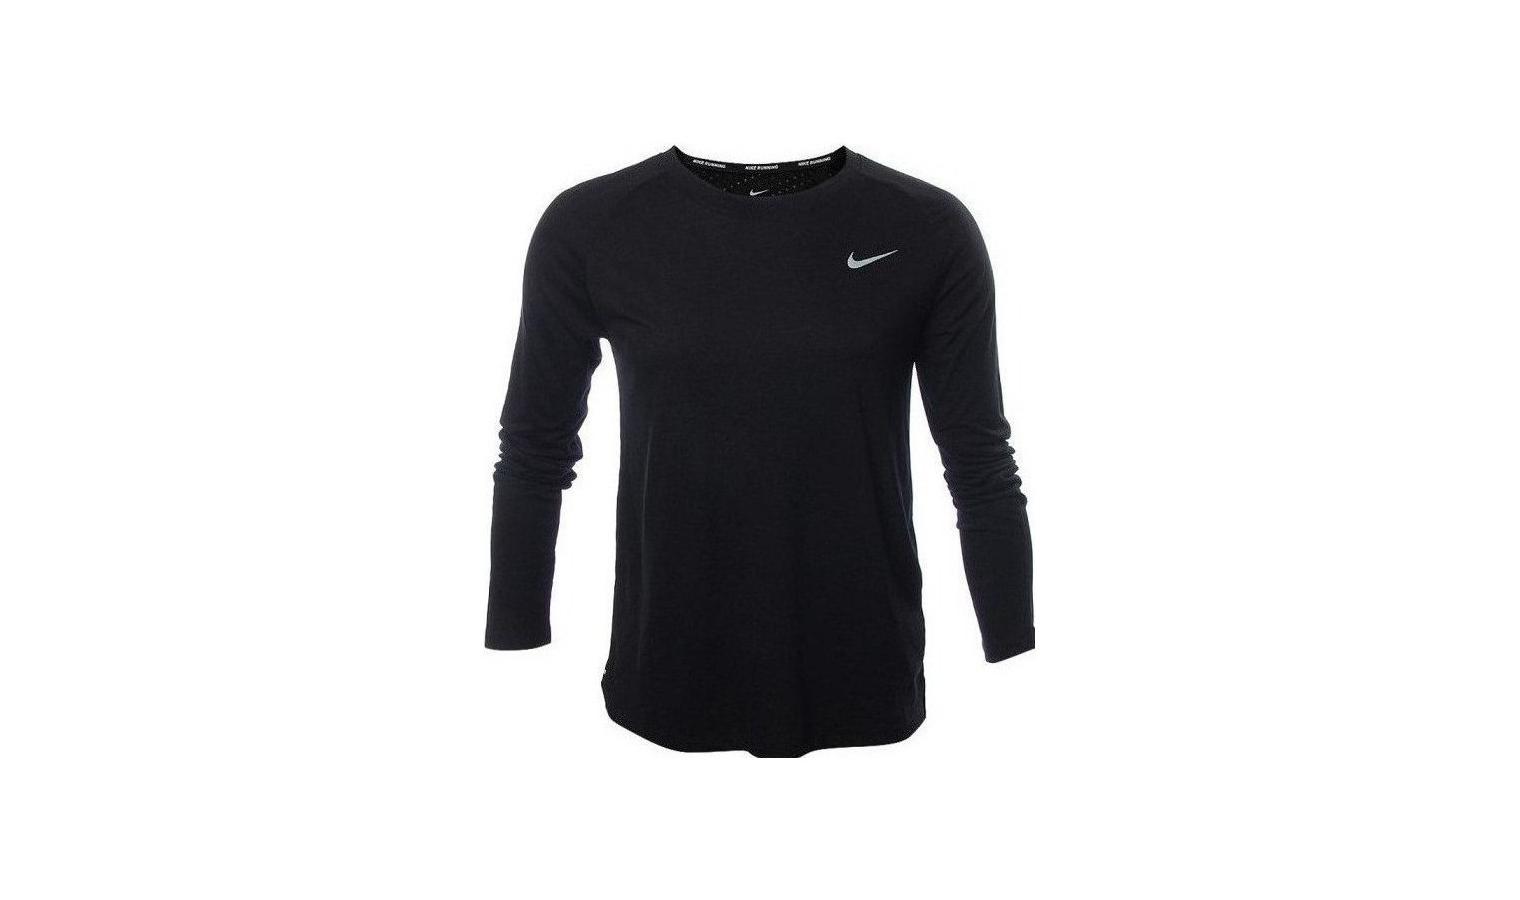 4e0d77995acd Dámske funkčné tričko Nike TAILWIND TOP LS W čierne